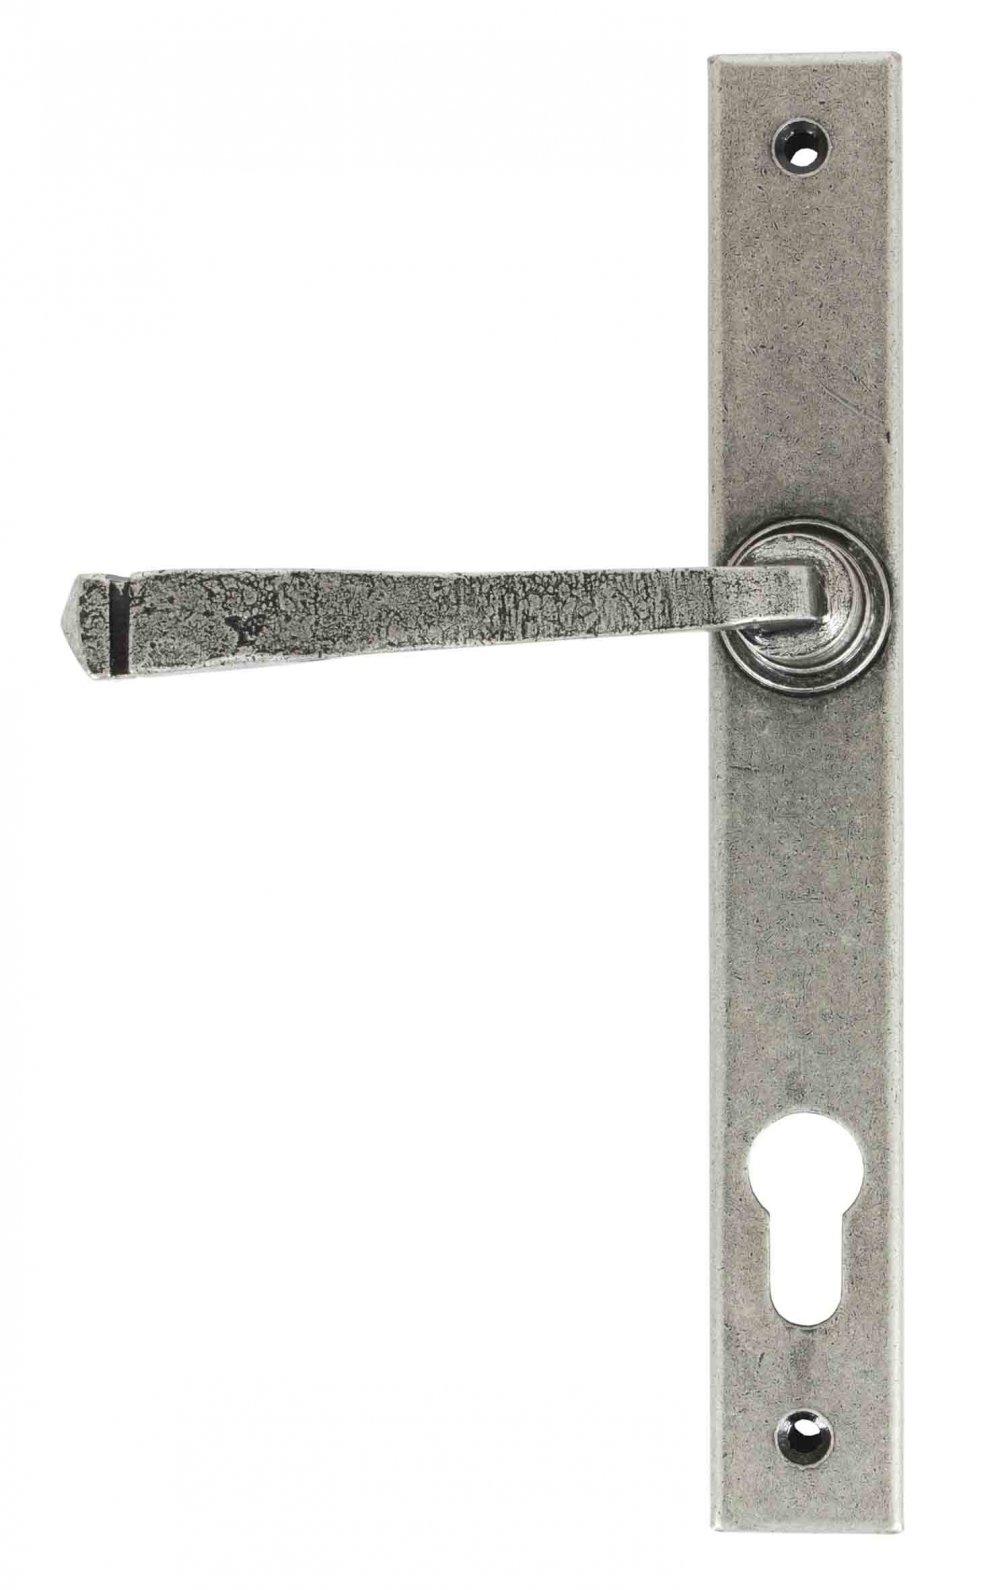 Avon Slimline Lever Espag. Lock Set - Pewter Patina image